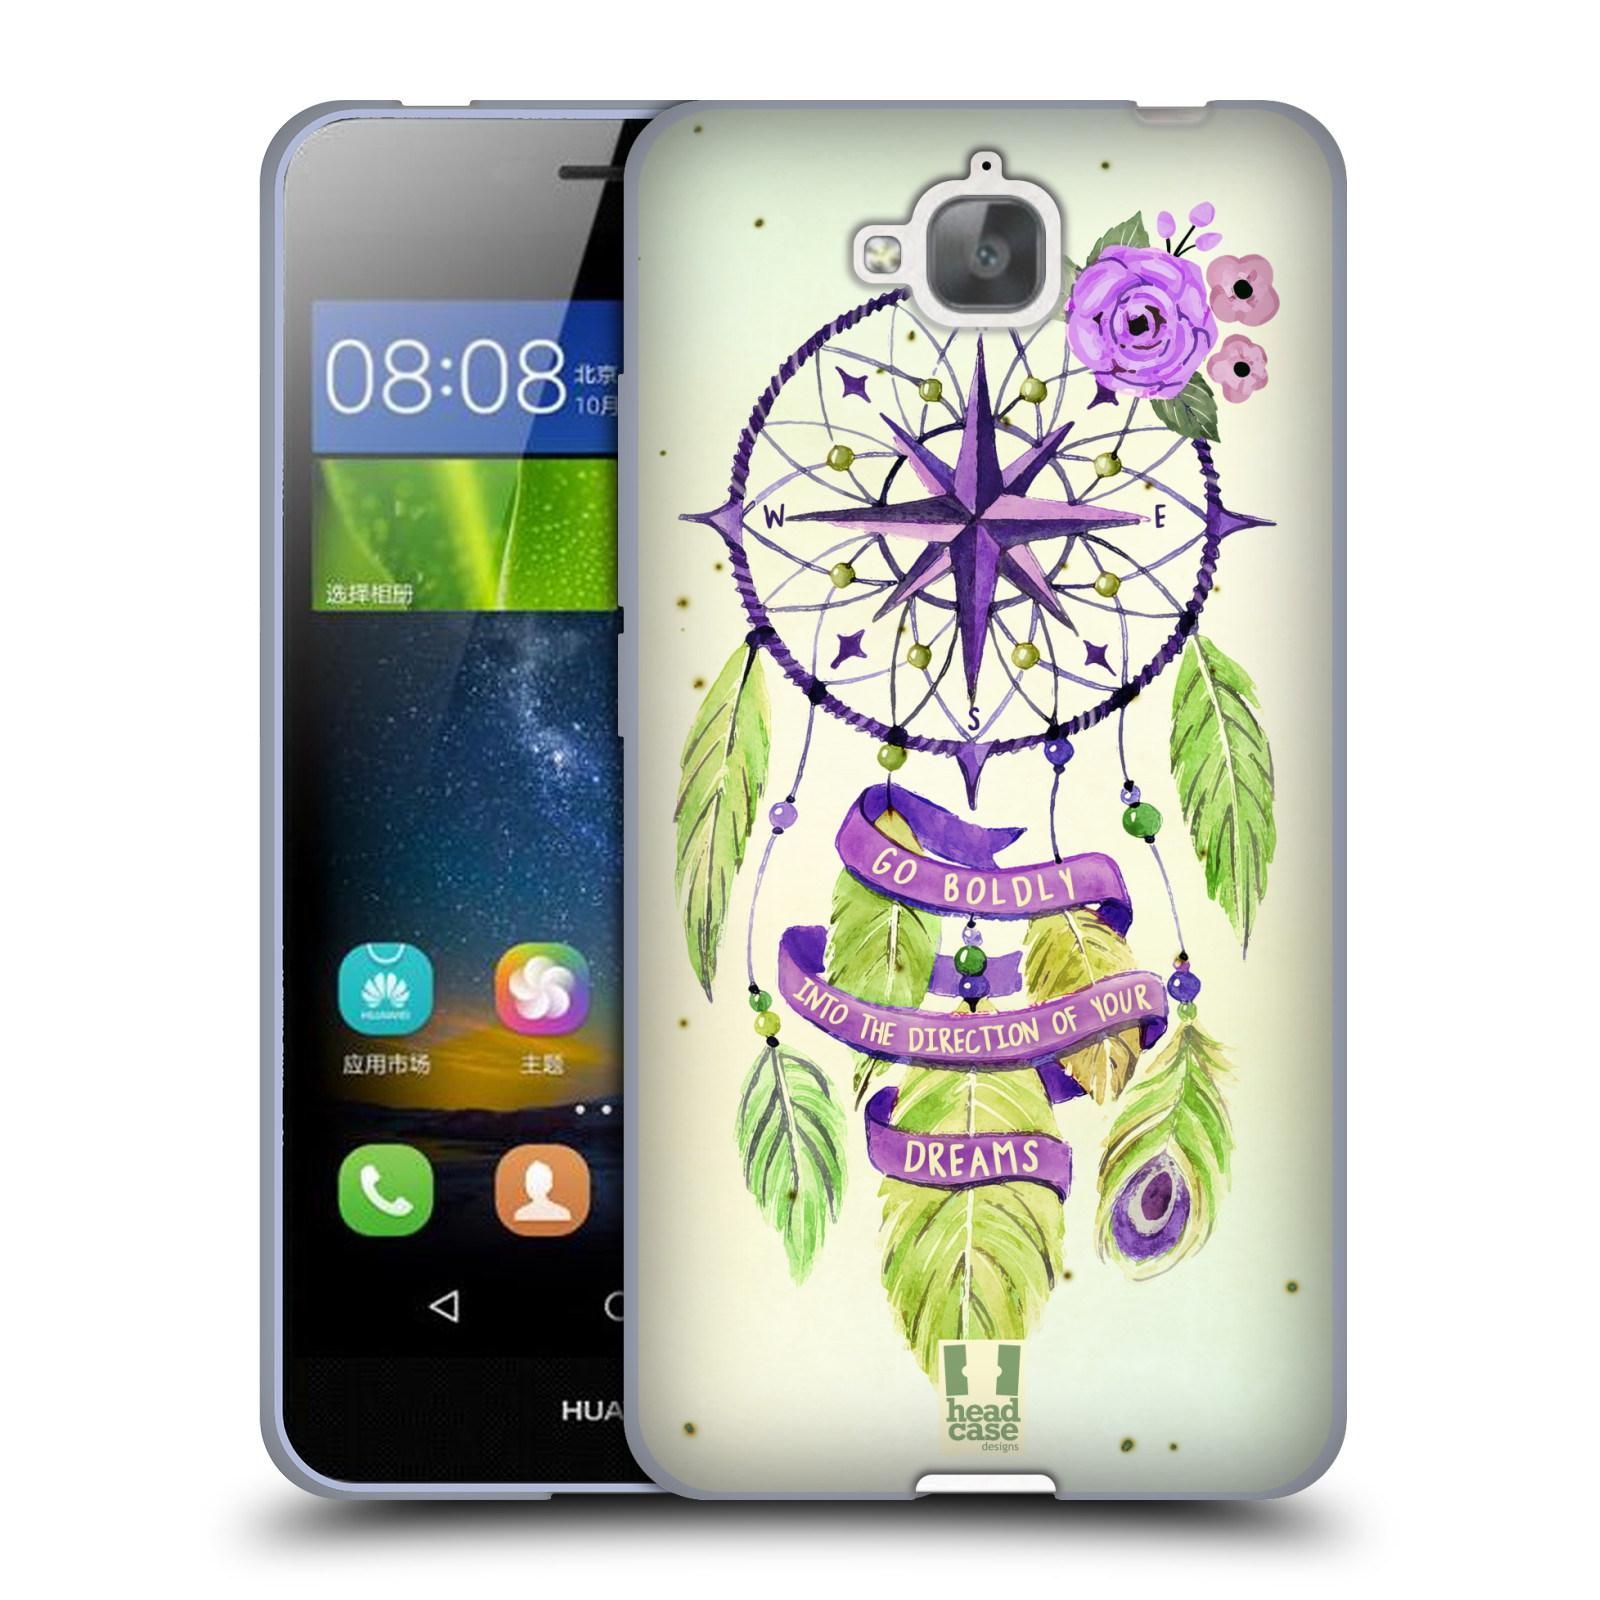 Silikonové pouzdro na mobil Huawei Y6 Pro Dual Sim HEAD CASE Lapač Assorted Compass